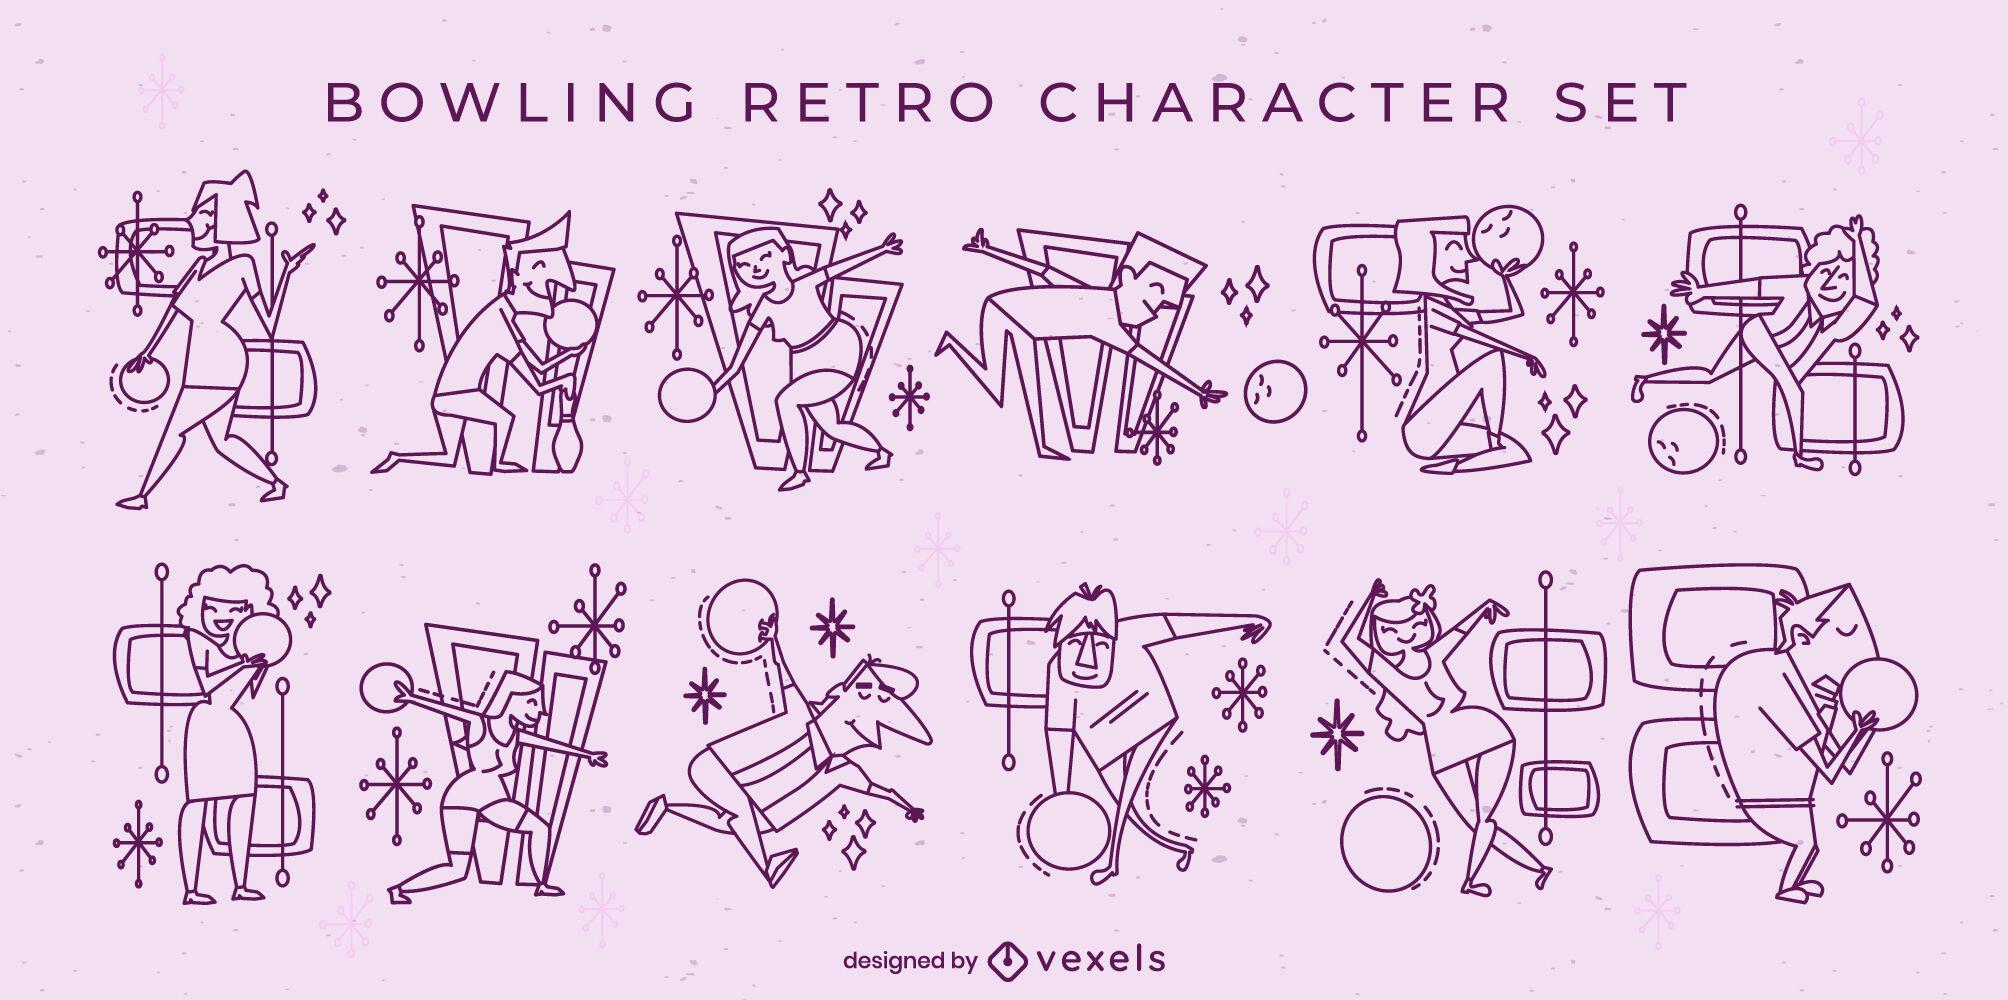 Conjunto de dibujos animados retro de personajes de bolos